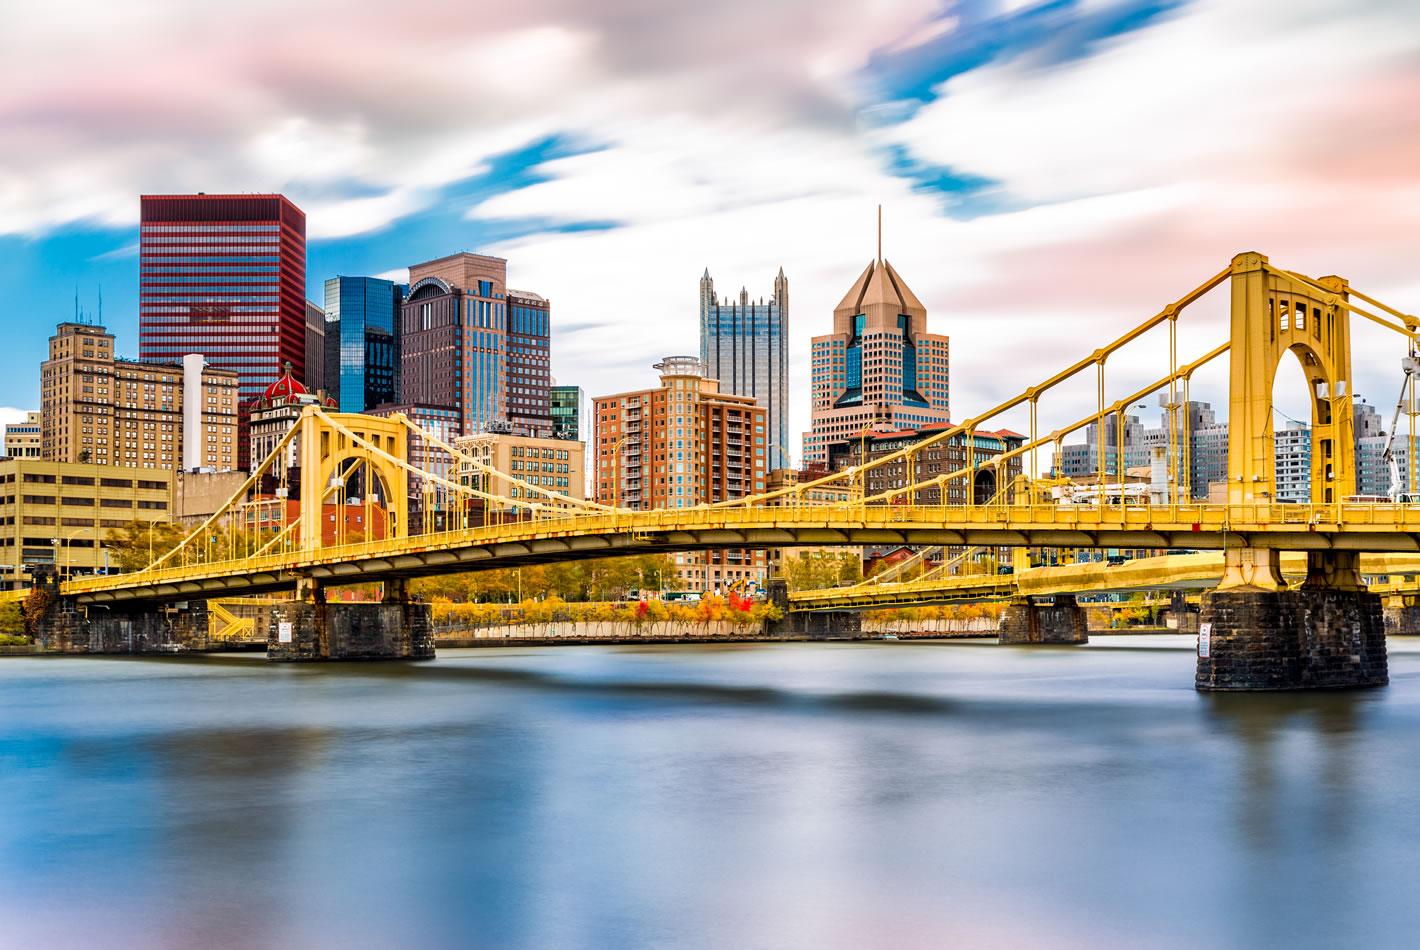 Omni William Penn Hotel in Pittsburgh, Pennsylvania